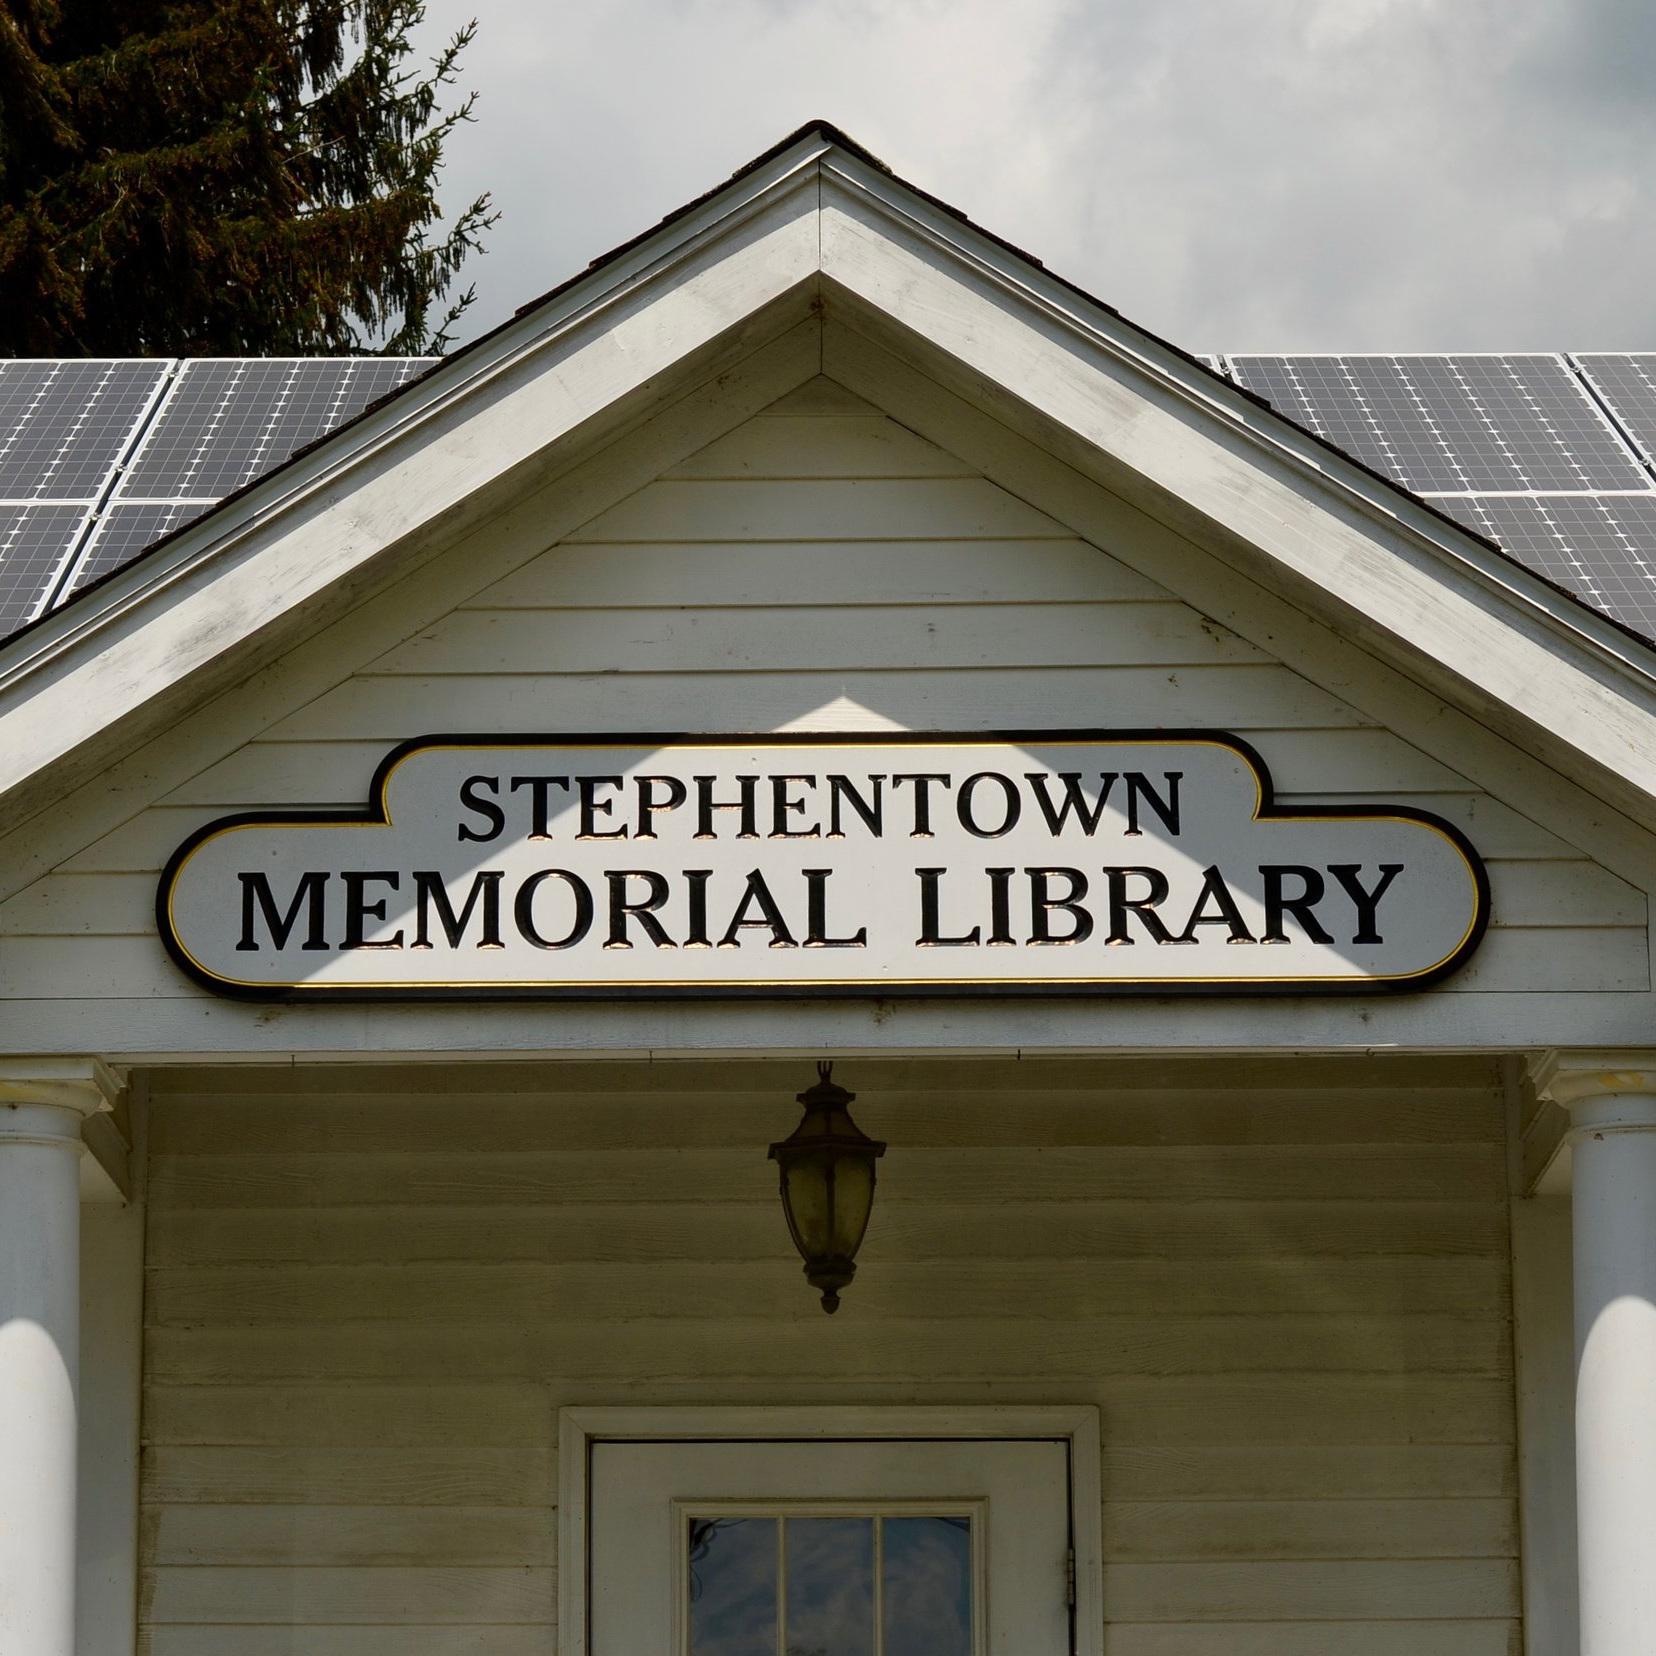 Stephentown Memorial Library